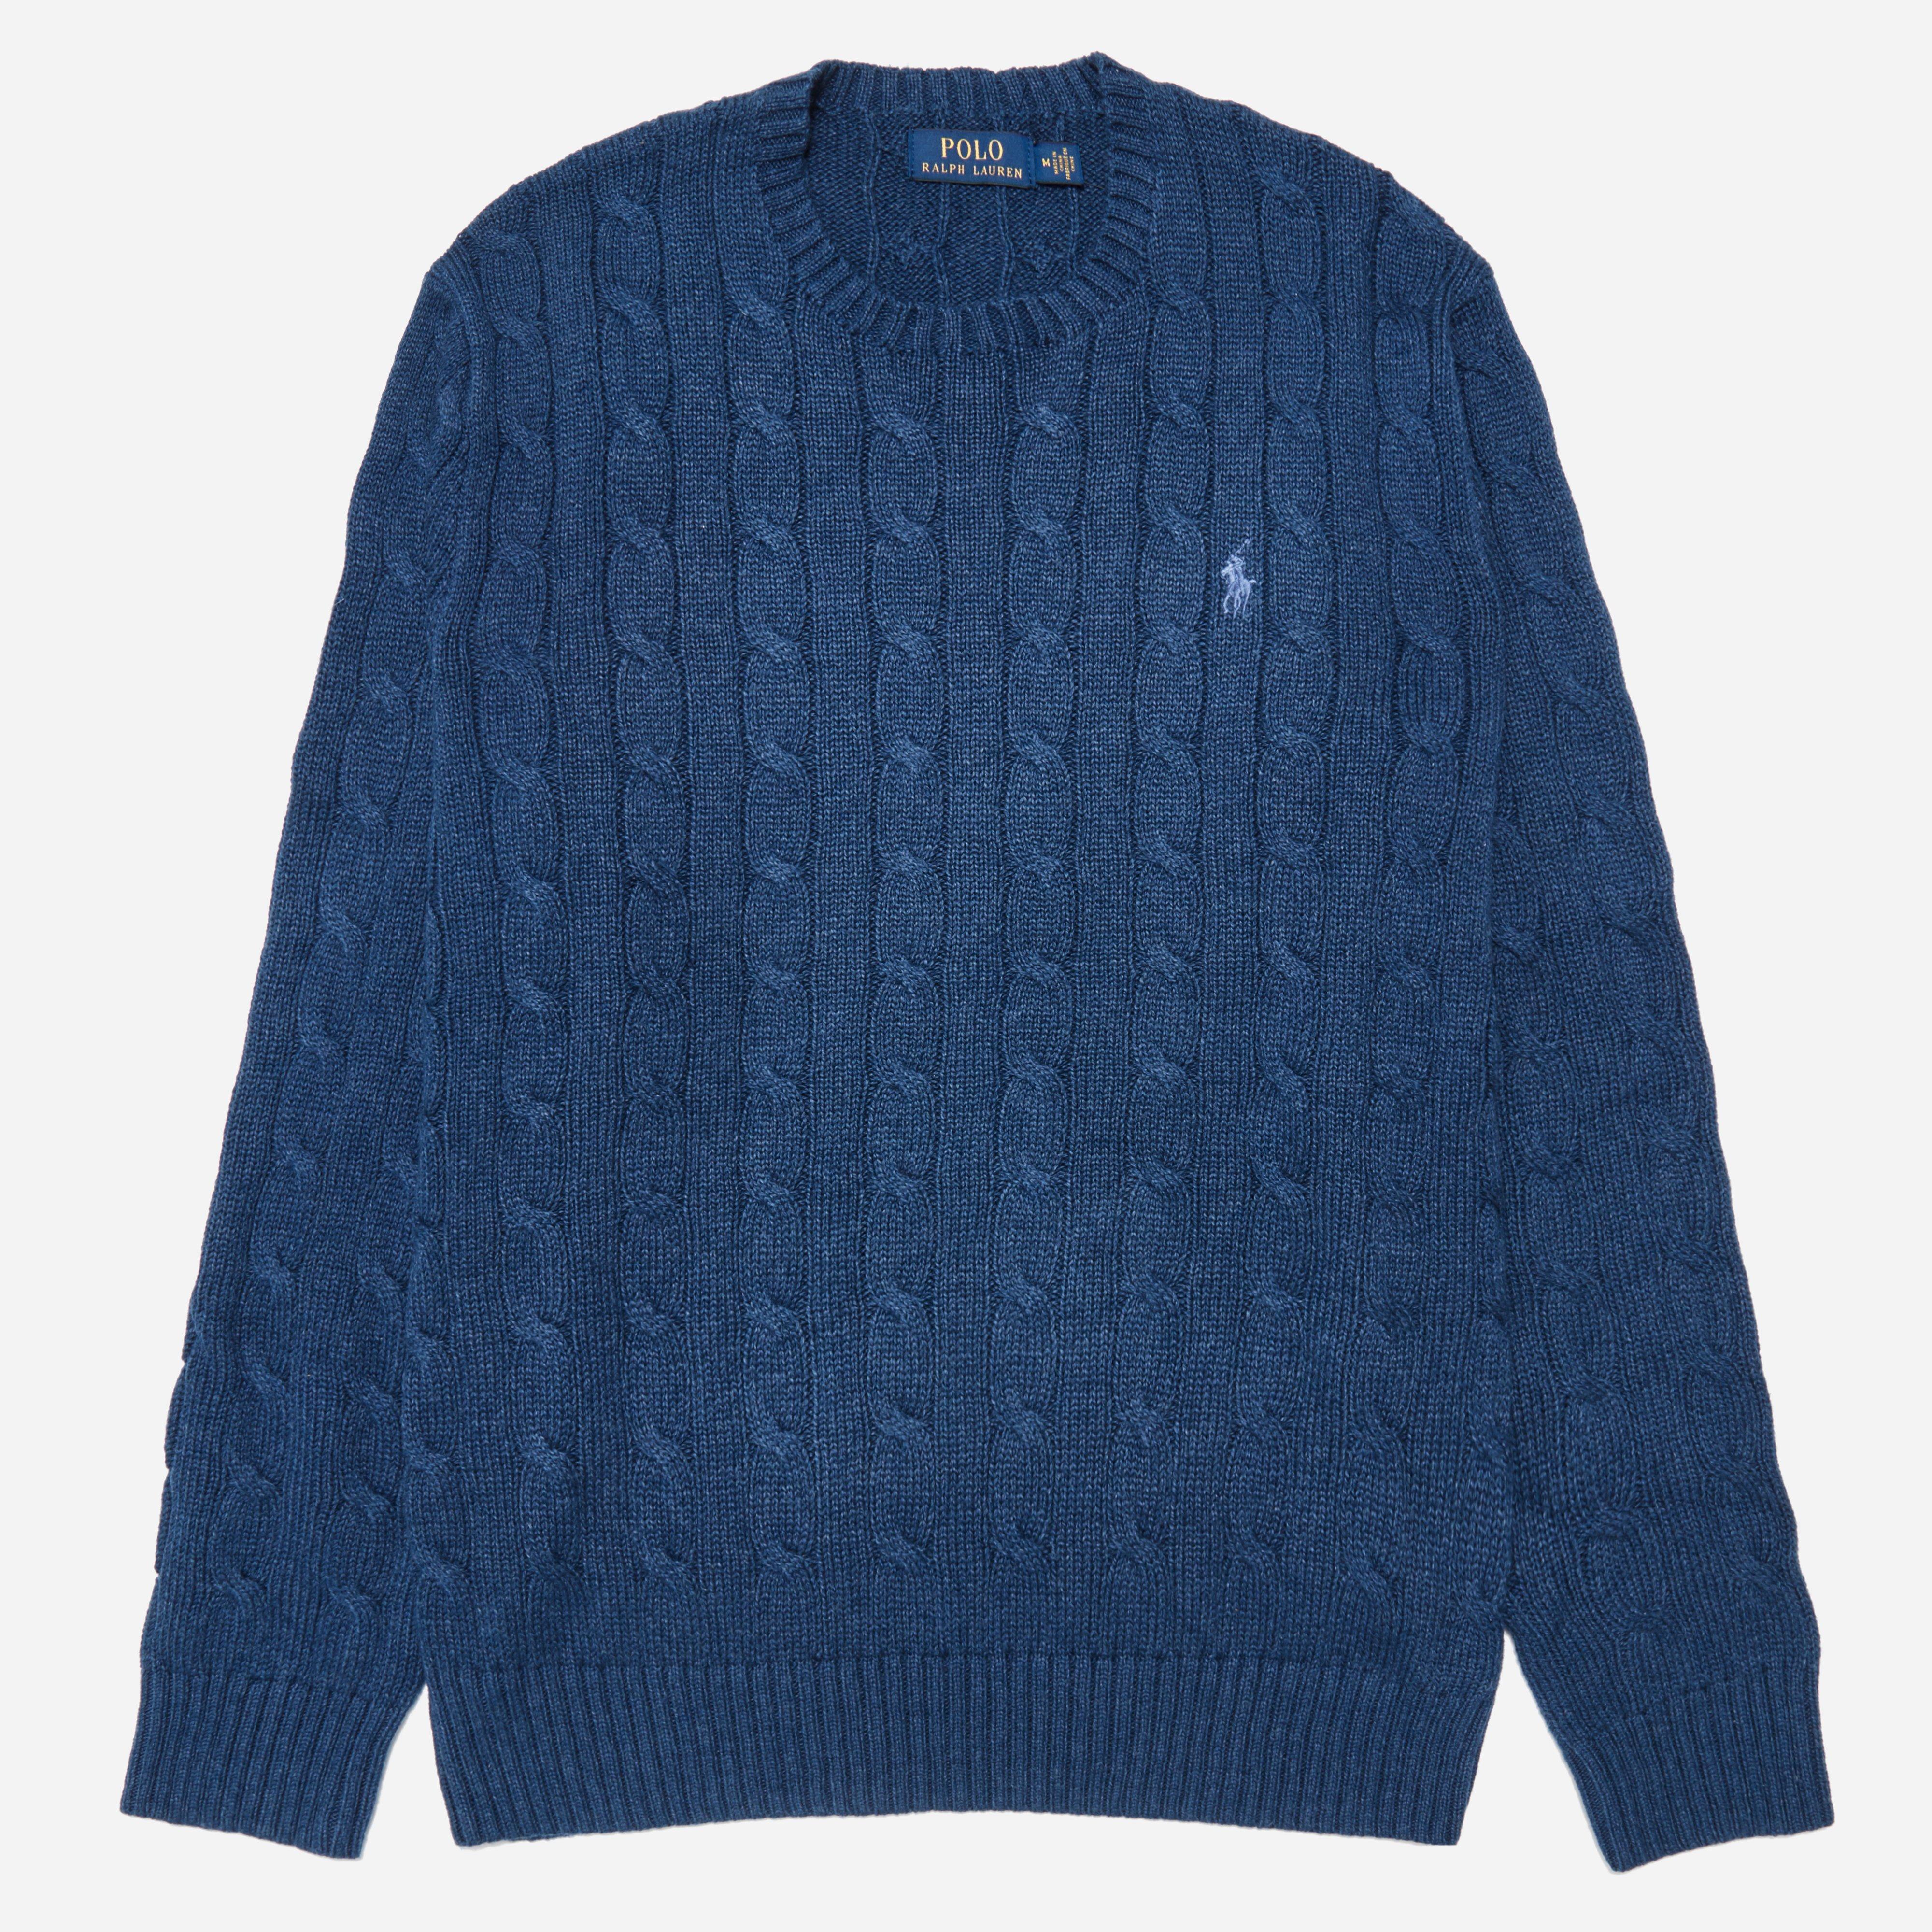 Polo Ralph Lauren Cable Knit